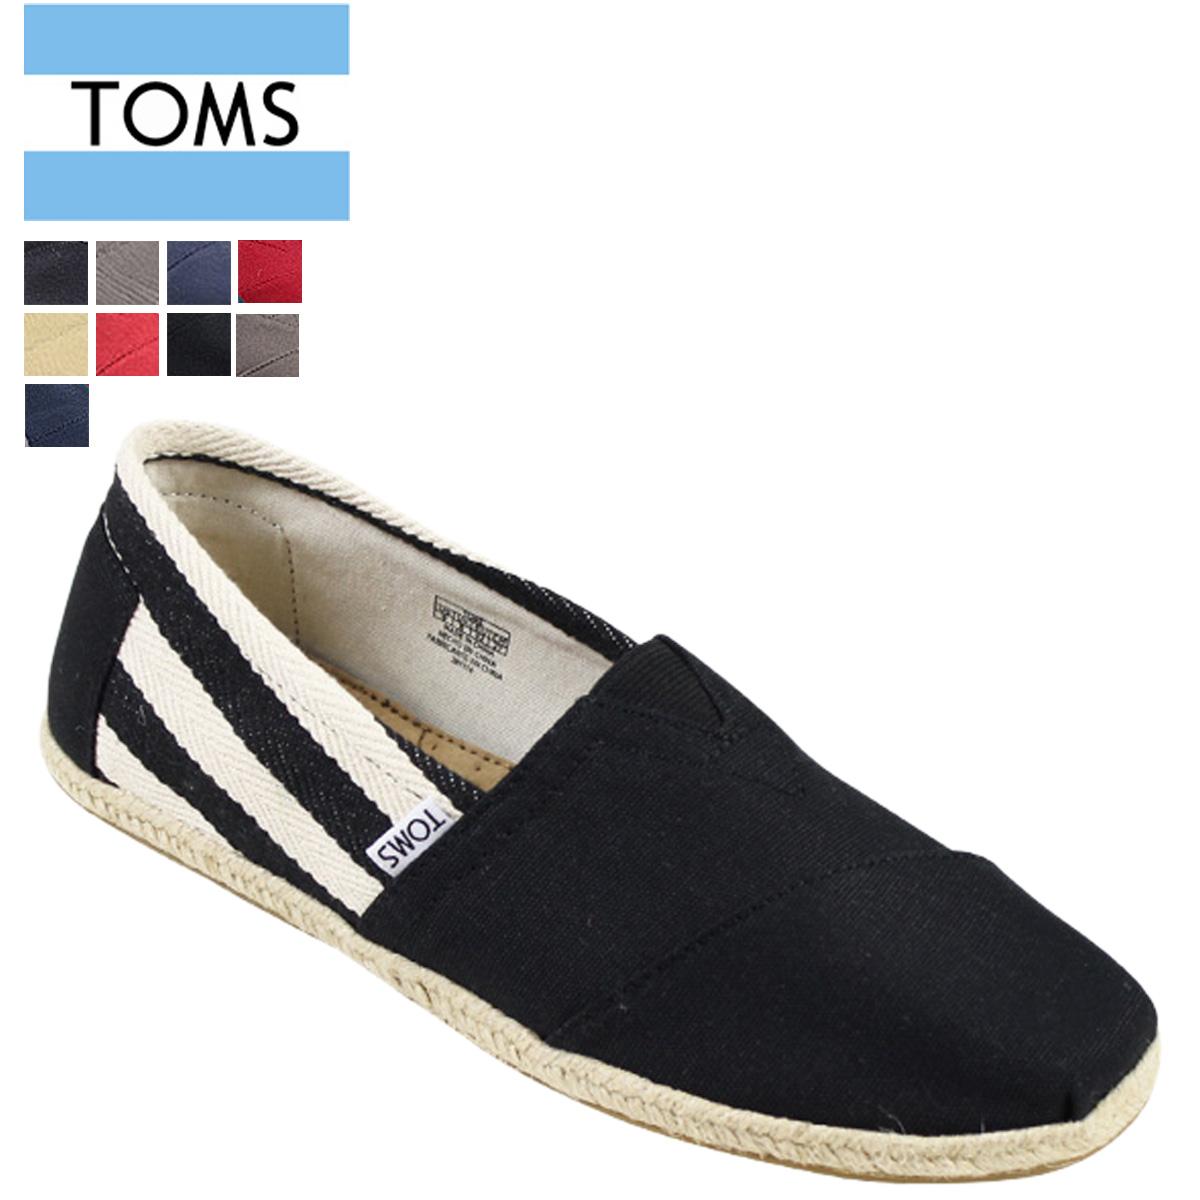 ALLSPORTS: Thoms Shoes TOMS SHOES Slip-ons UNIVERSITY MEN